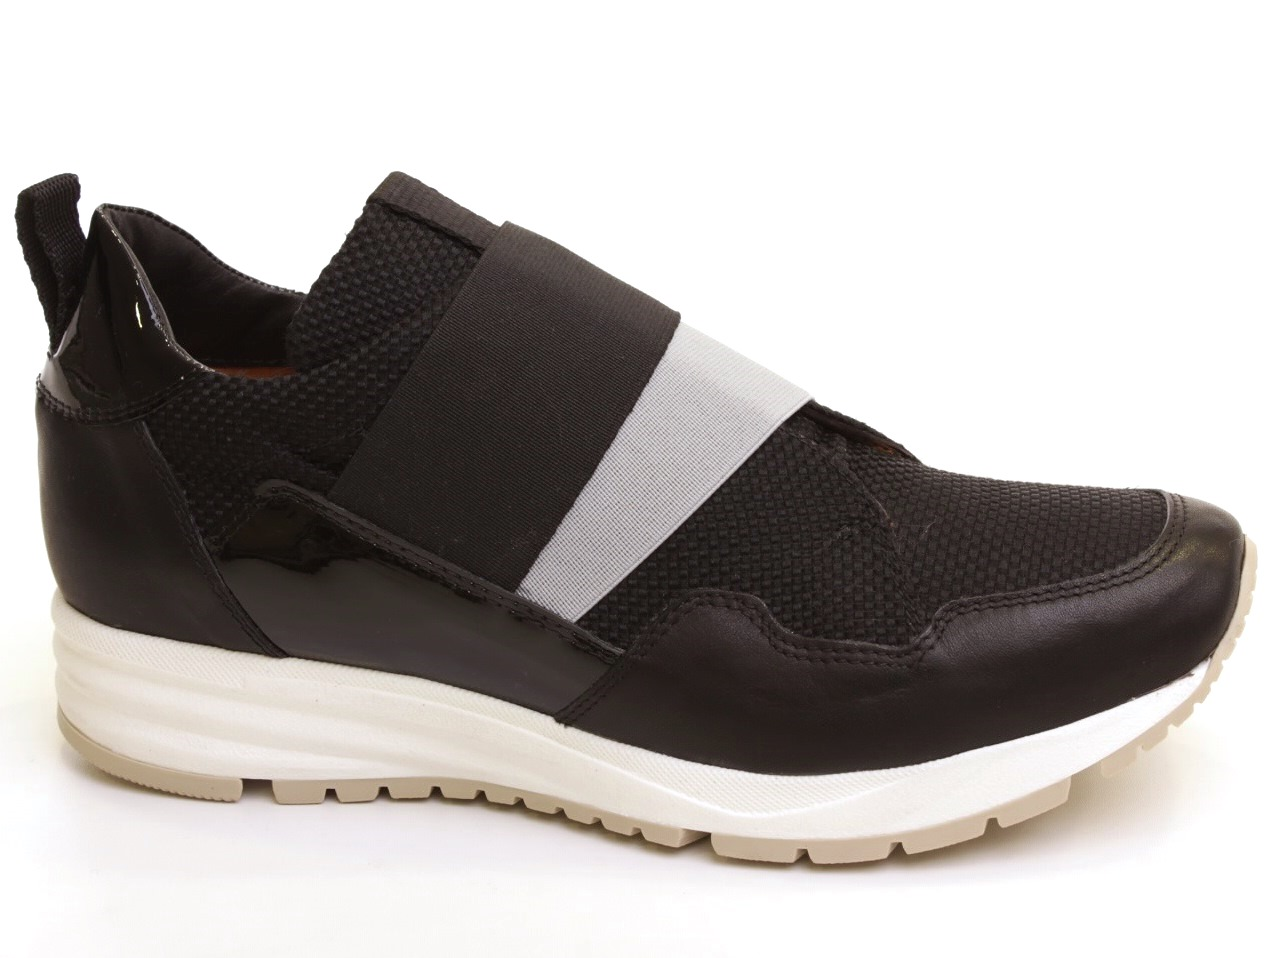 Sneakers and Espadrilles Vannel - 001 8425/02